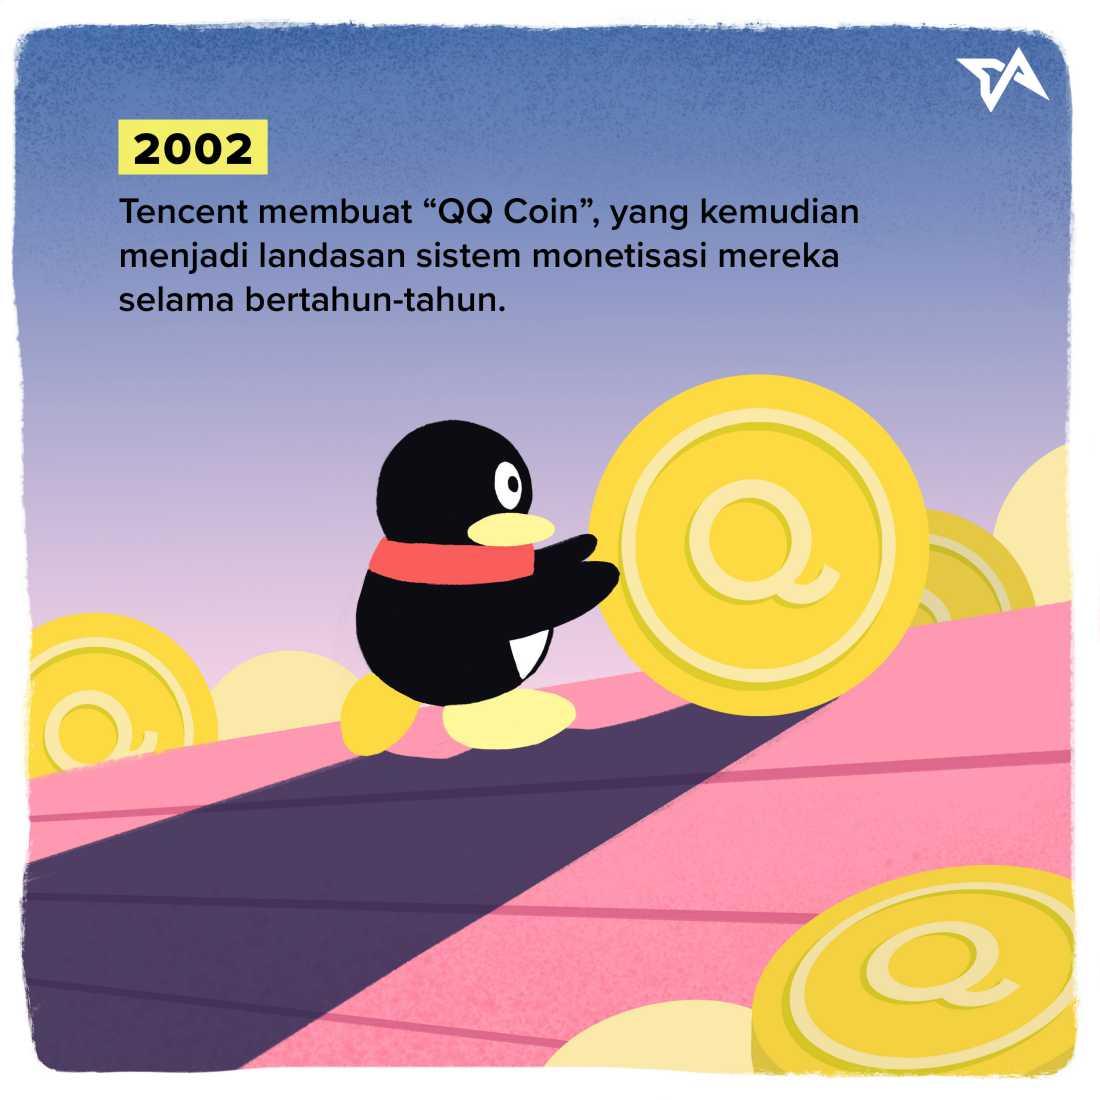 Pony Ma Tencent 10